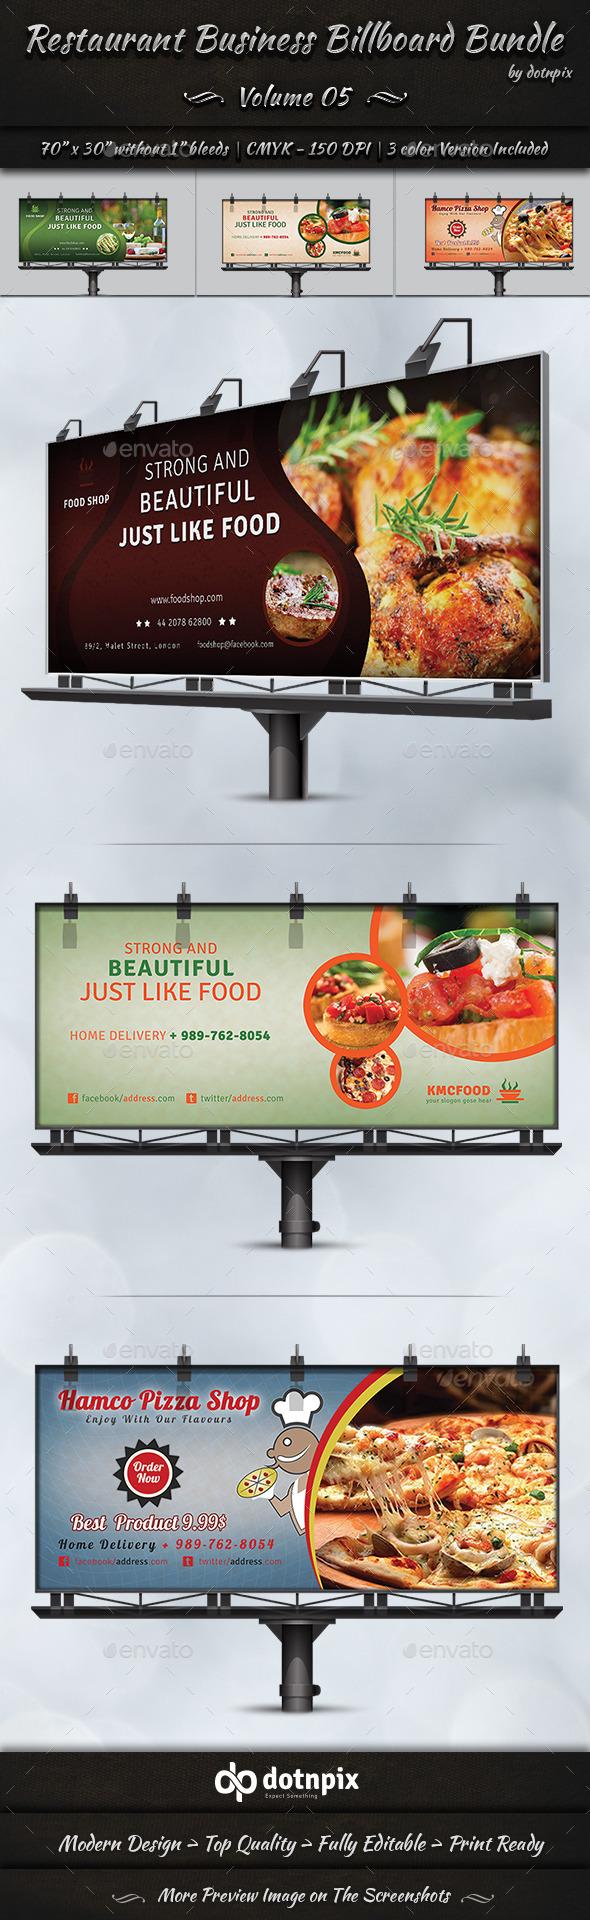 GraphicRiver Restaurant Business Billboard Bundle Volume 5 9029483